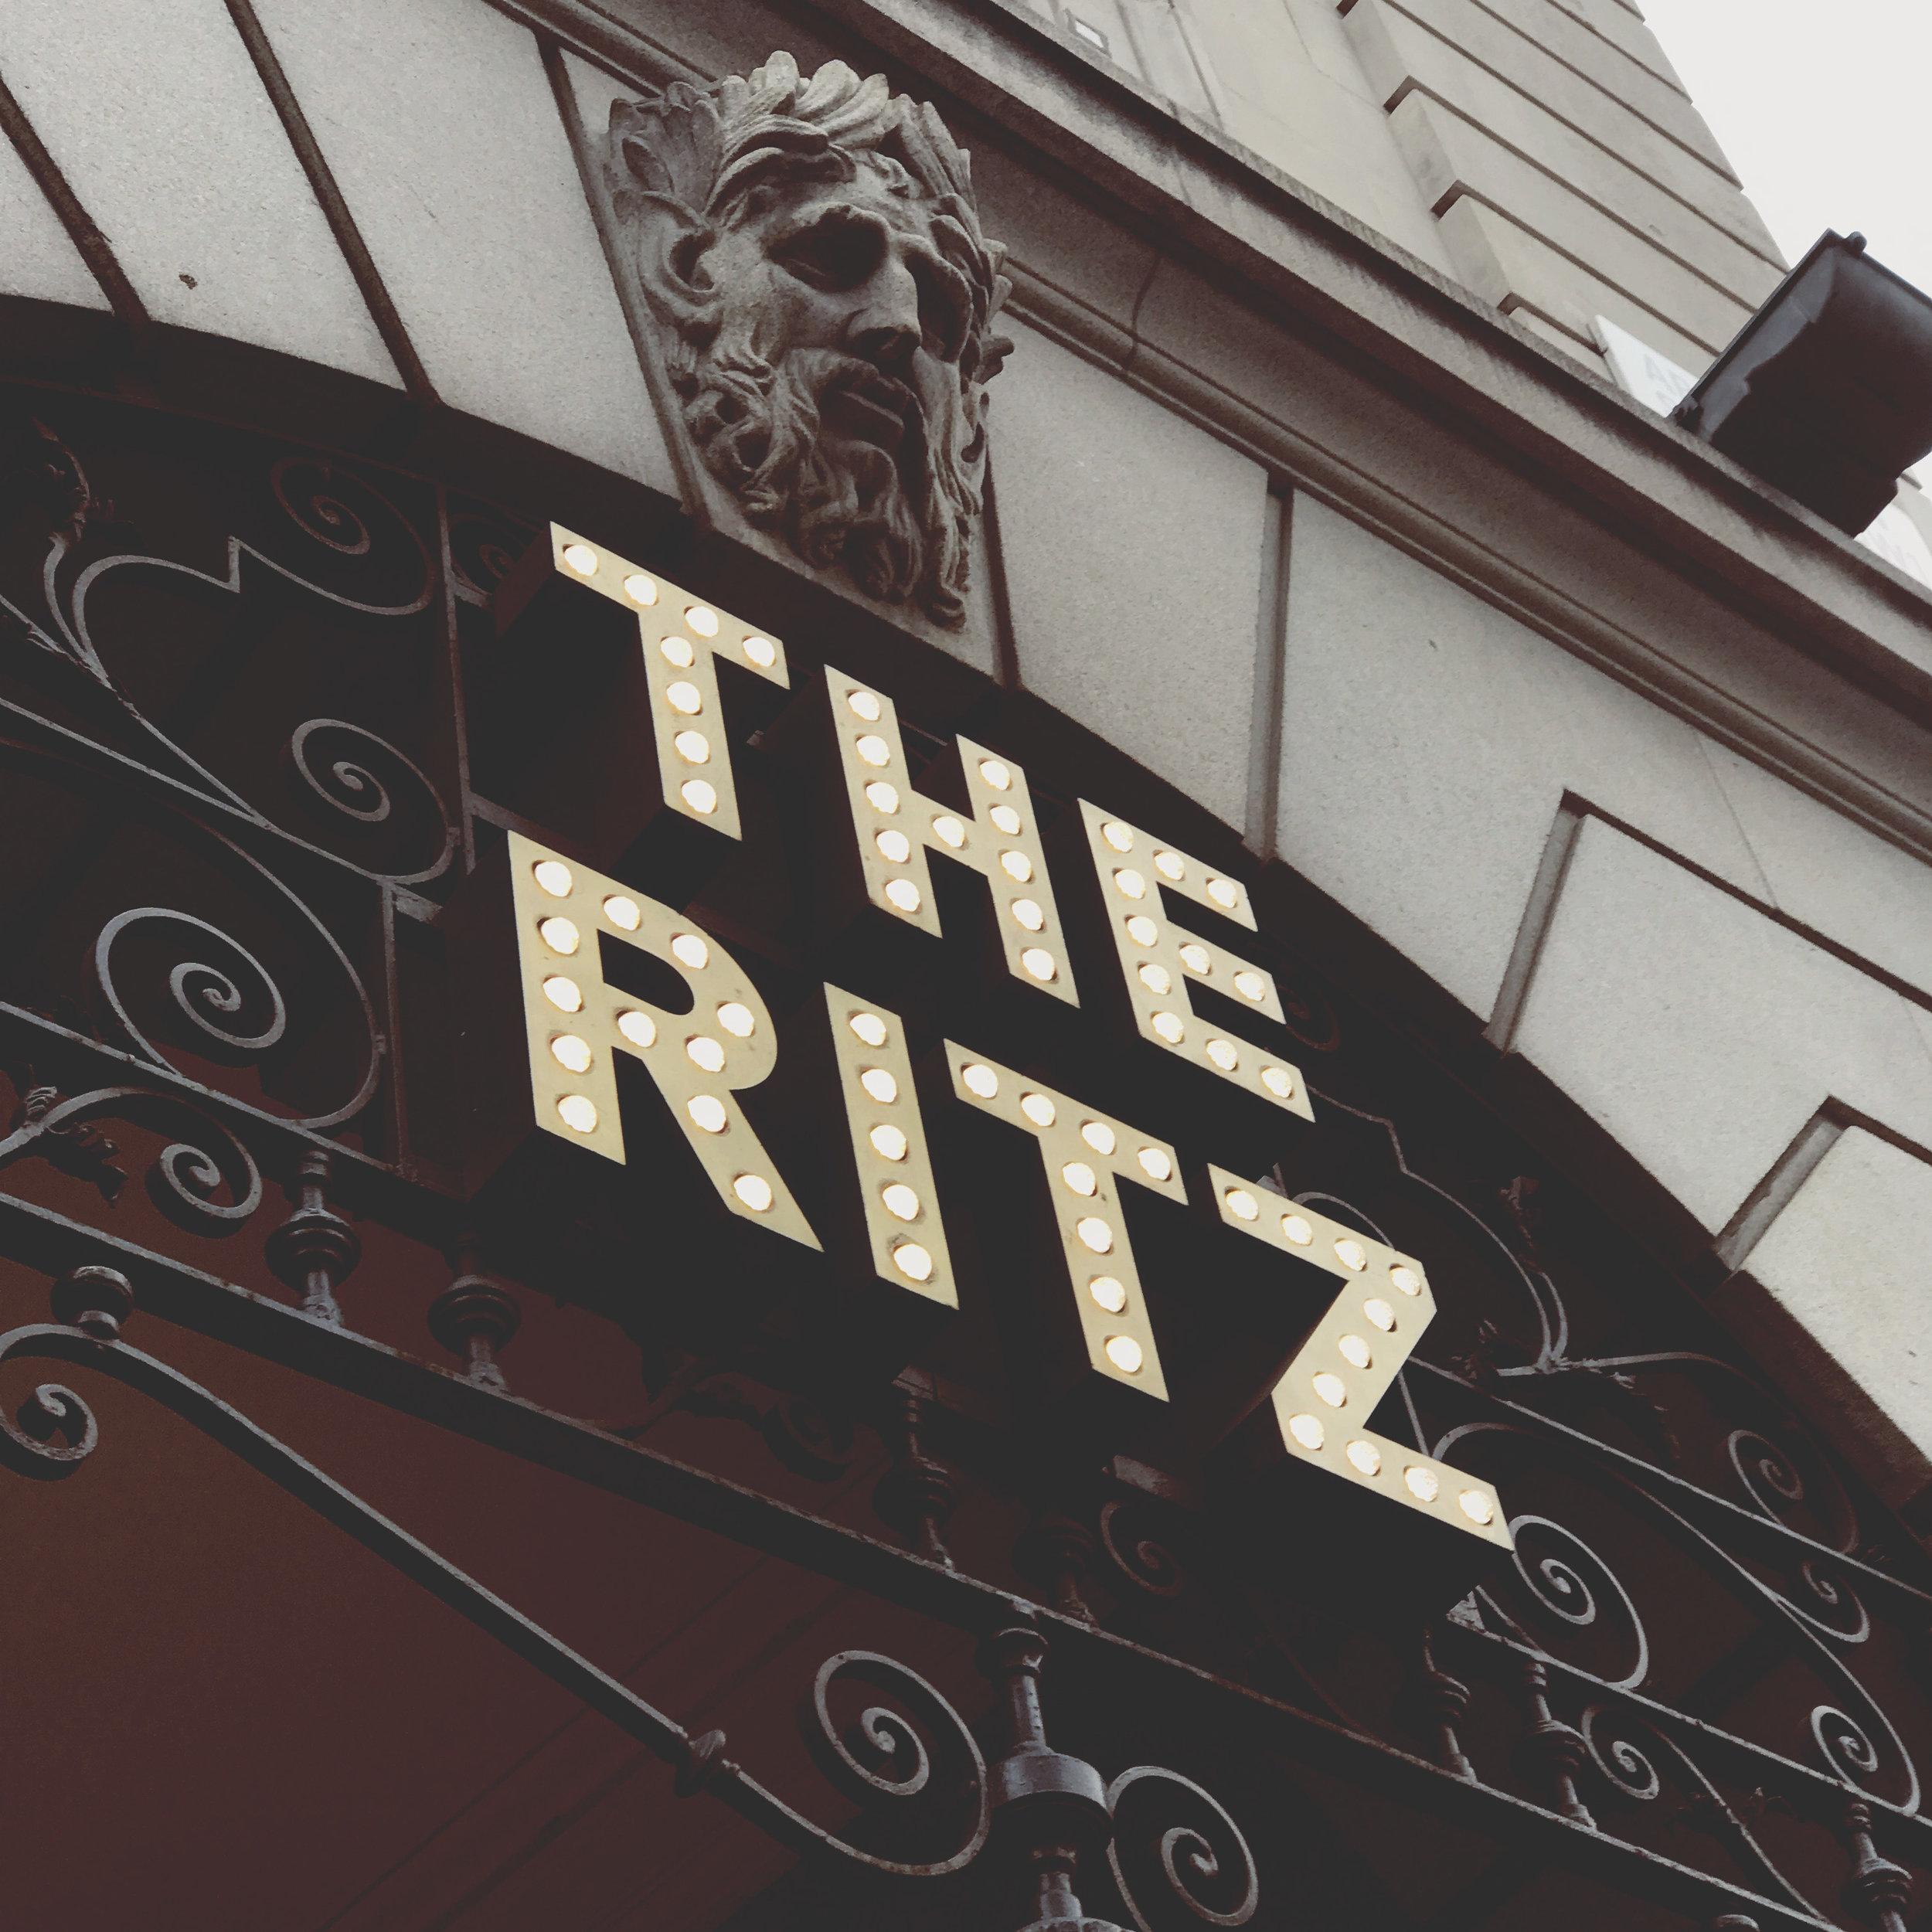 The Ritz London - #Kurtantravels London Travel Guide Part 2 - BySarahRae.com